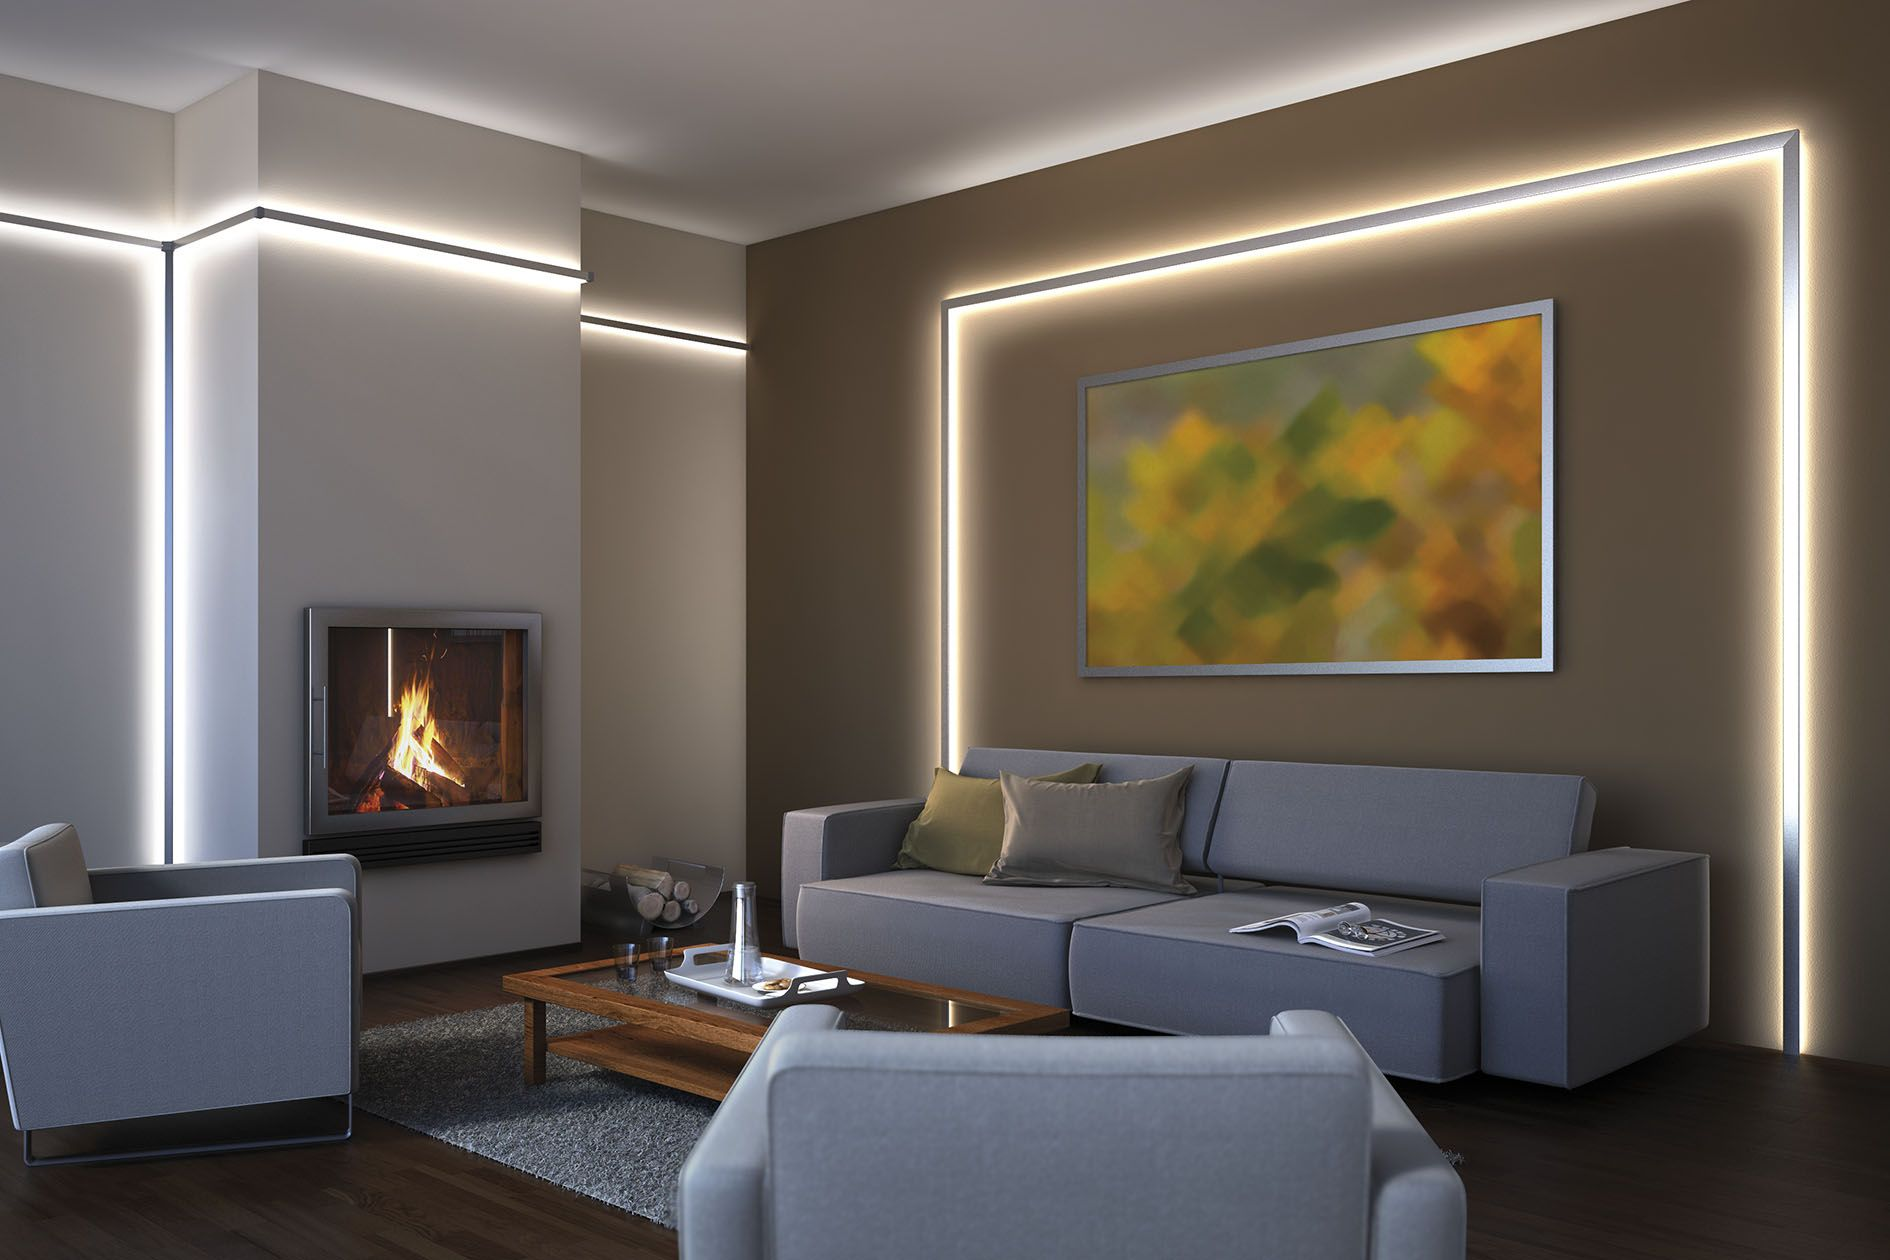 paulmann led profiles | İç aydınlatma / indoor lighting, Wohnzimmer